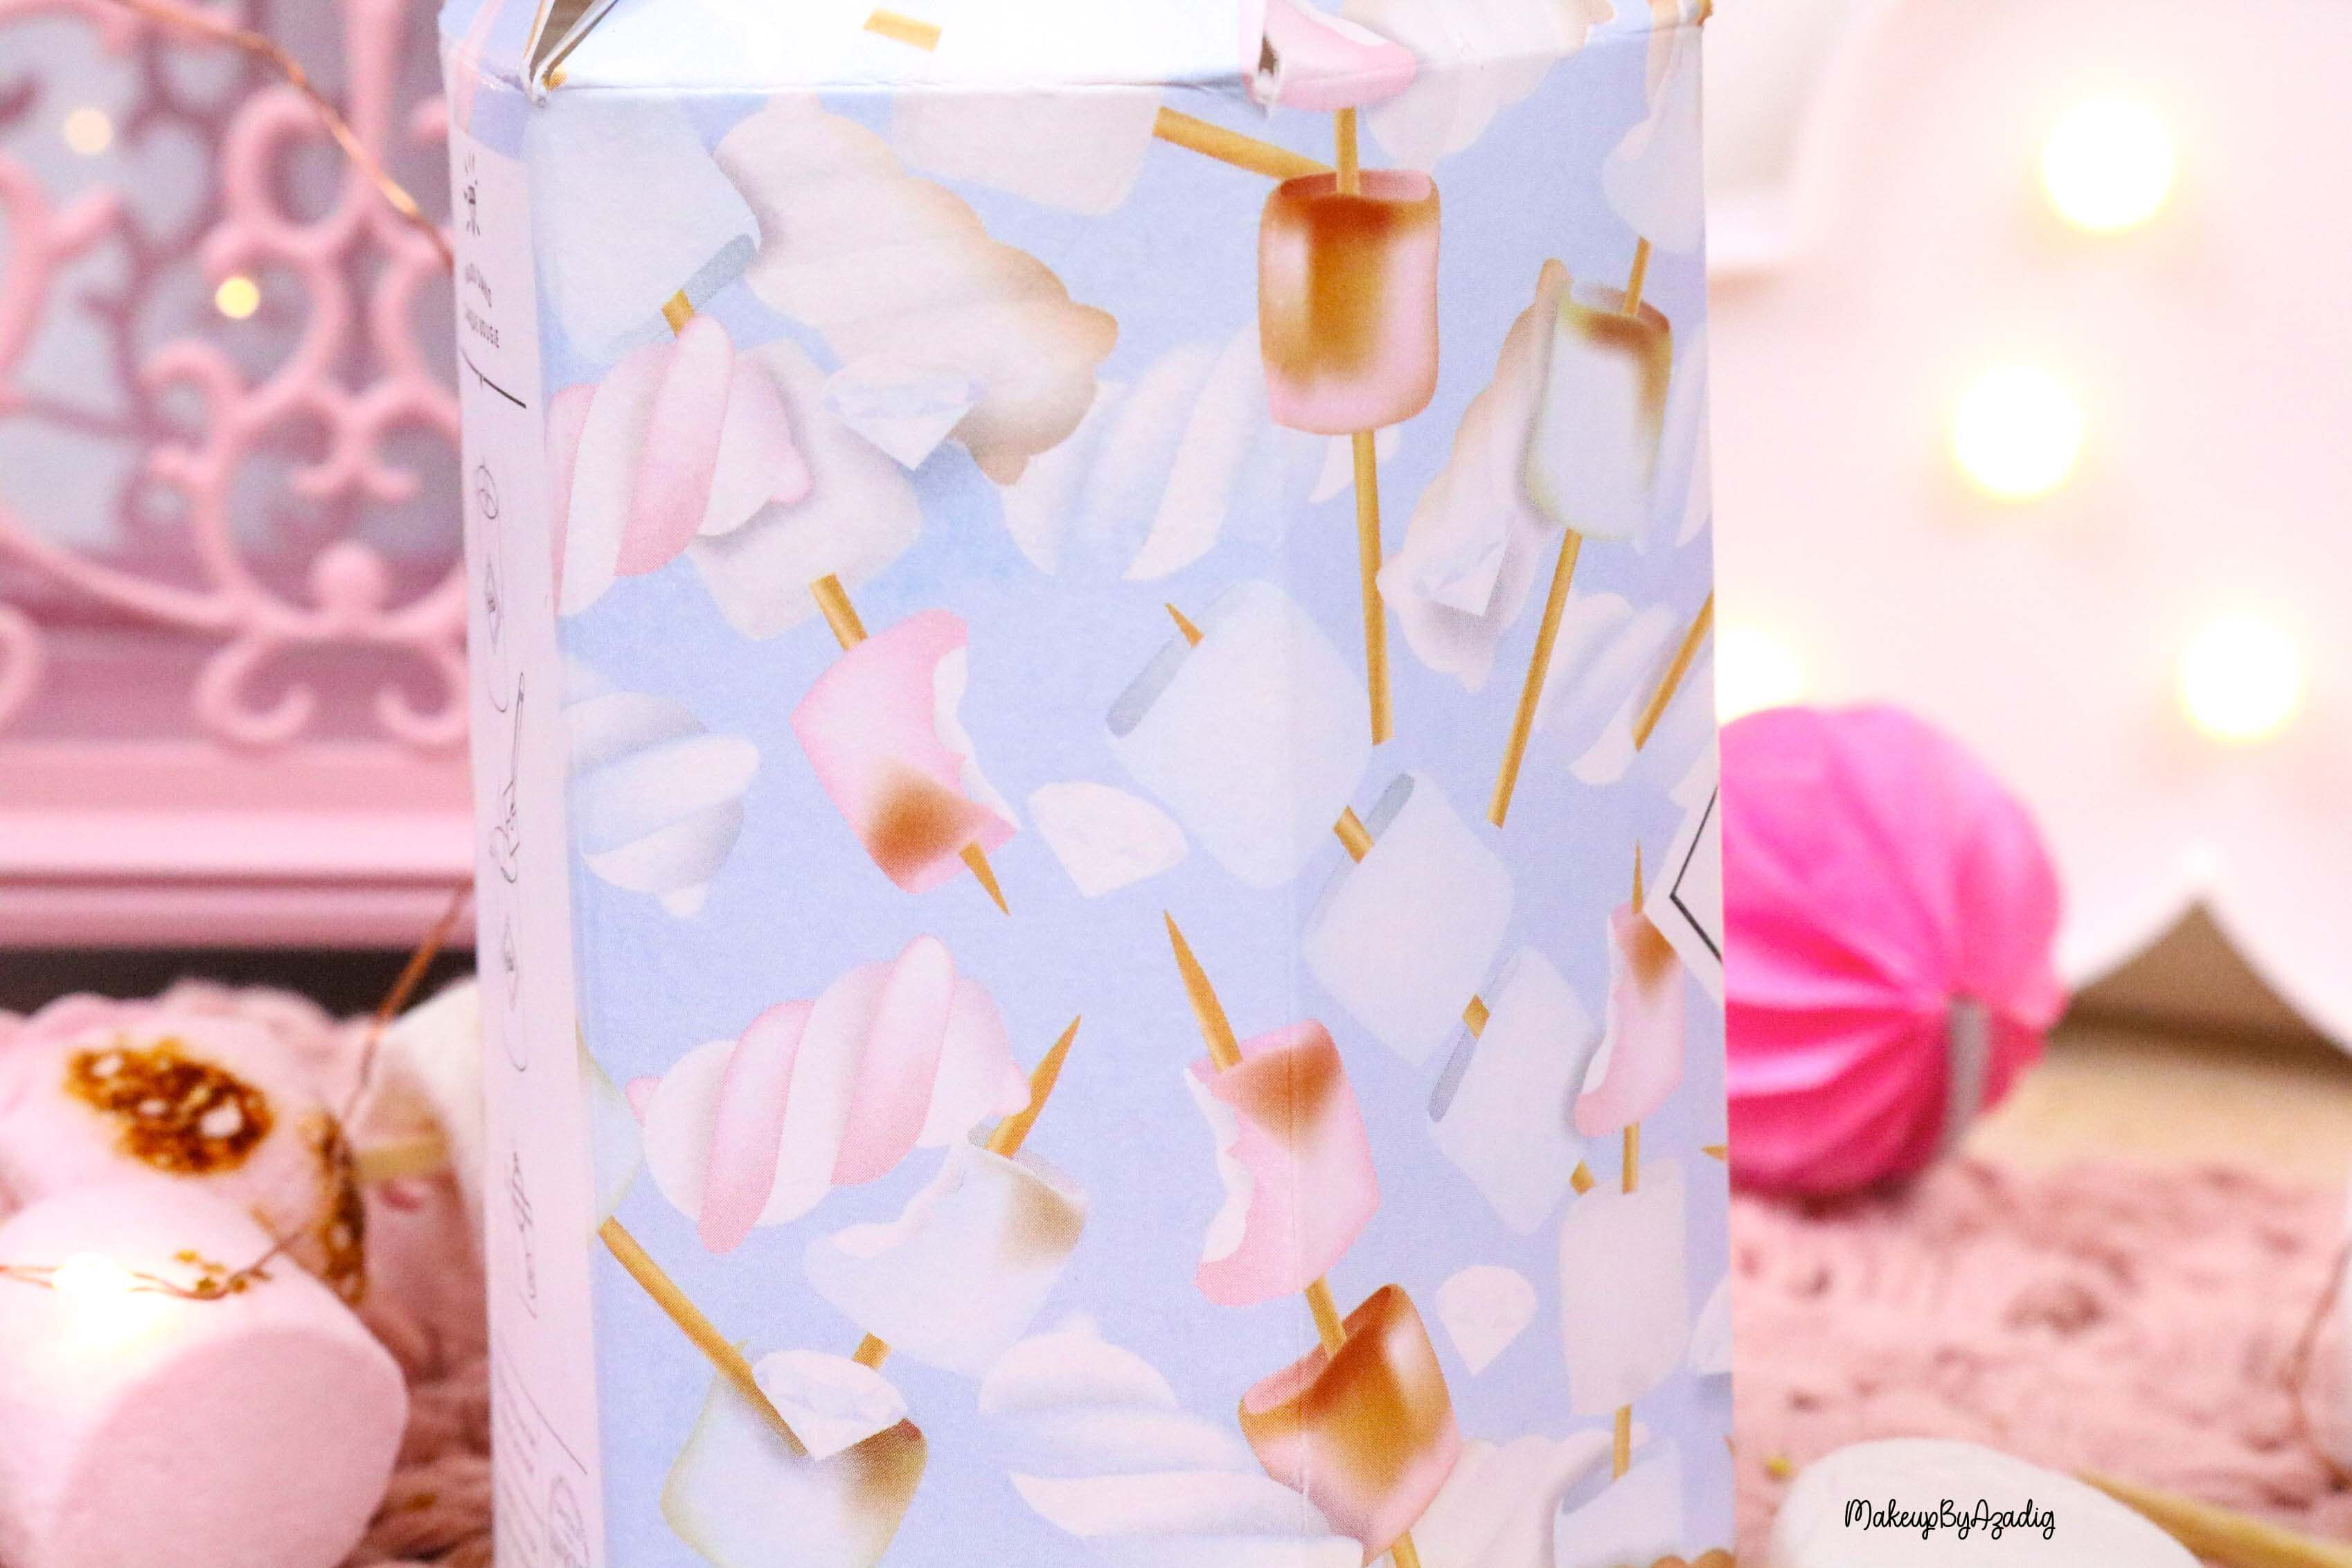 my-jolie-candle-bougie-bijou-swarovski-argent-cadeau-maman-mamie-femme-makeupbyazadig-collector-chamallow-avis-prix-dessin